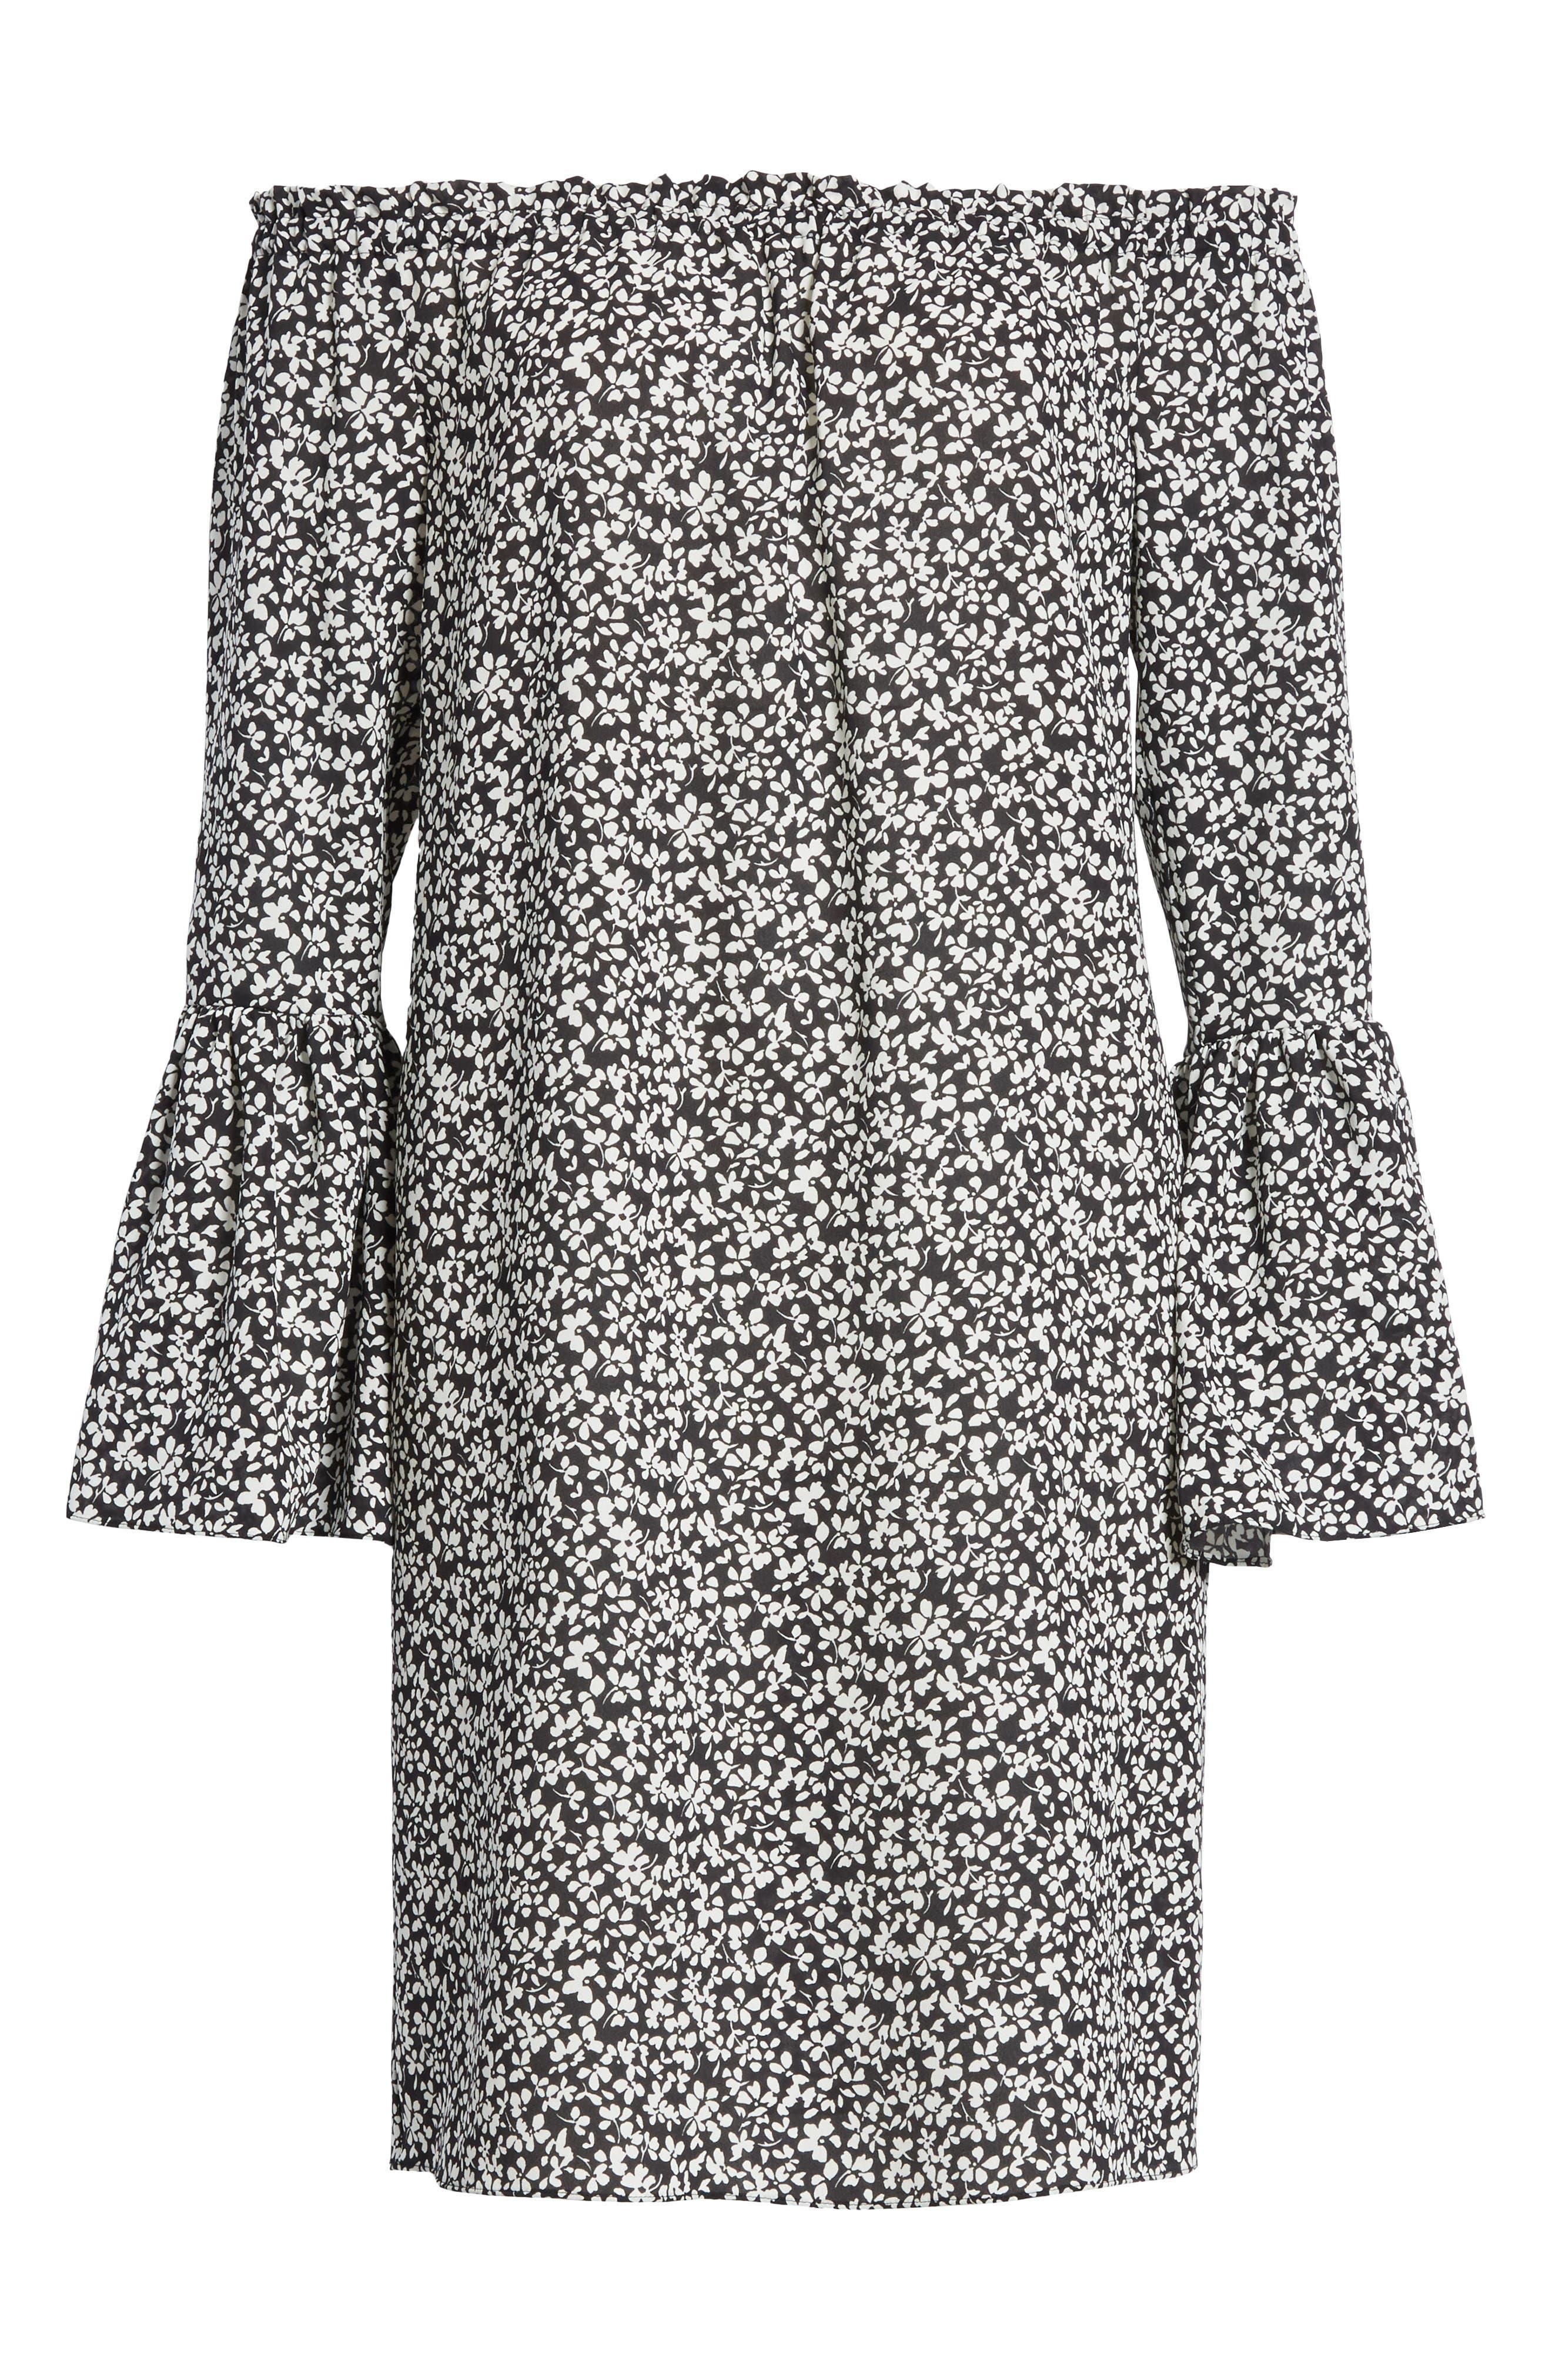 Print Silk Off the Shoulder Dress,                             Alternate thumbnail 6, color,                             003